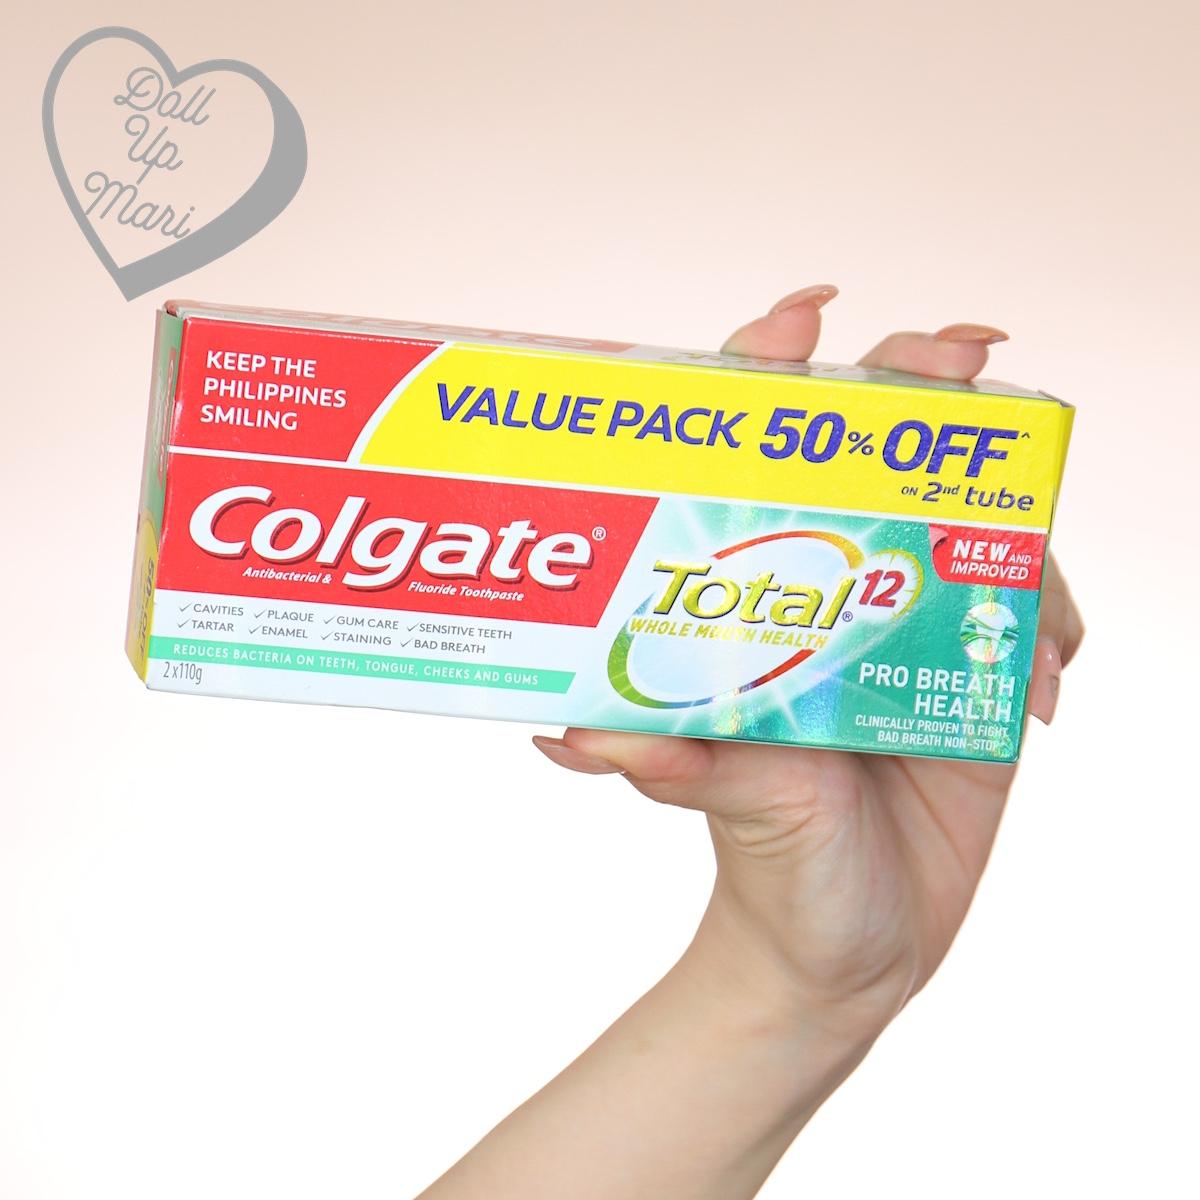 Colgate Total 12 Pro Breath Health Toothpaste